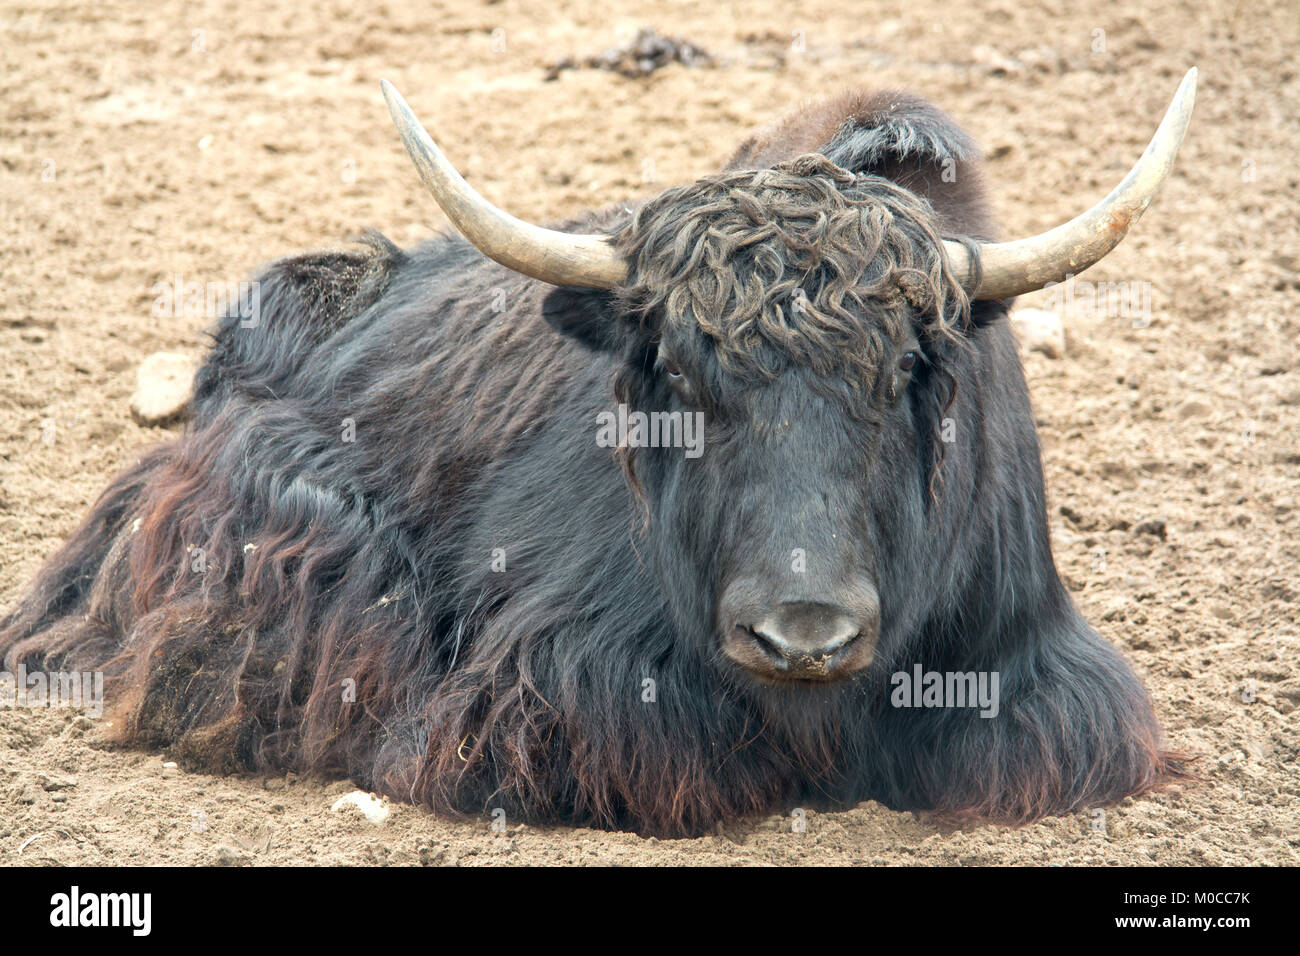 Tibetan bull has a rest on sand - Stock Image